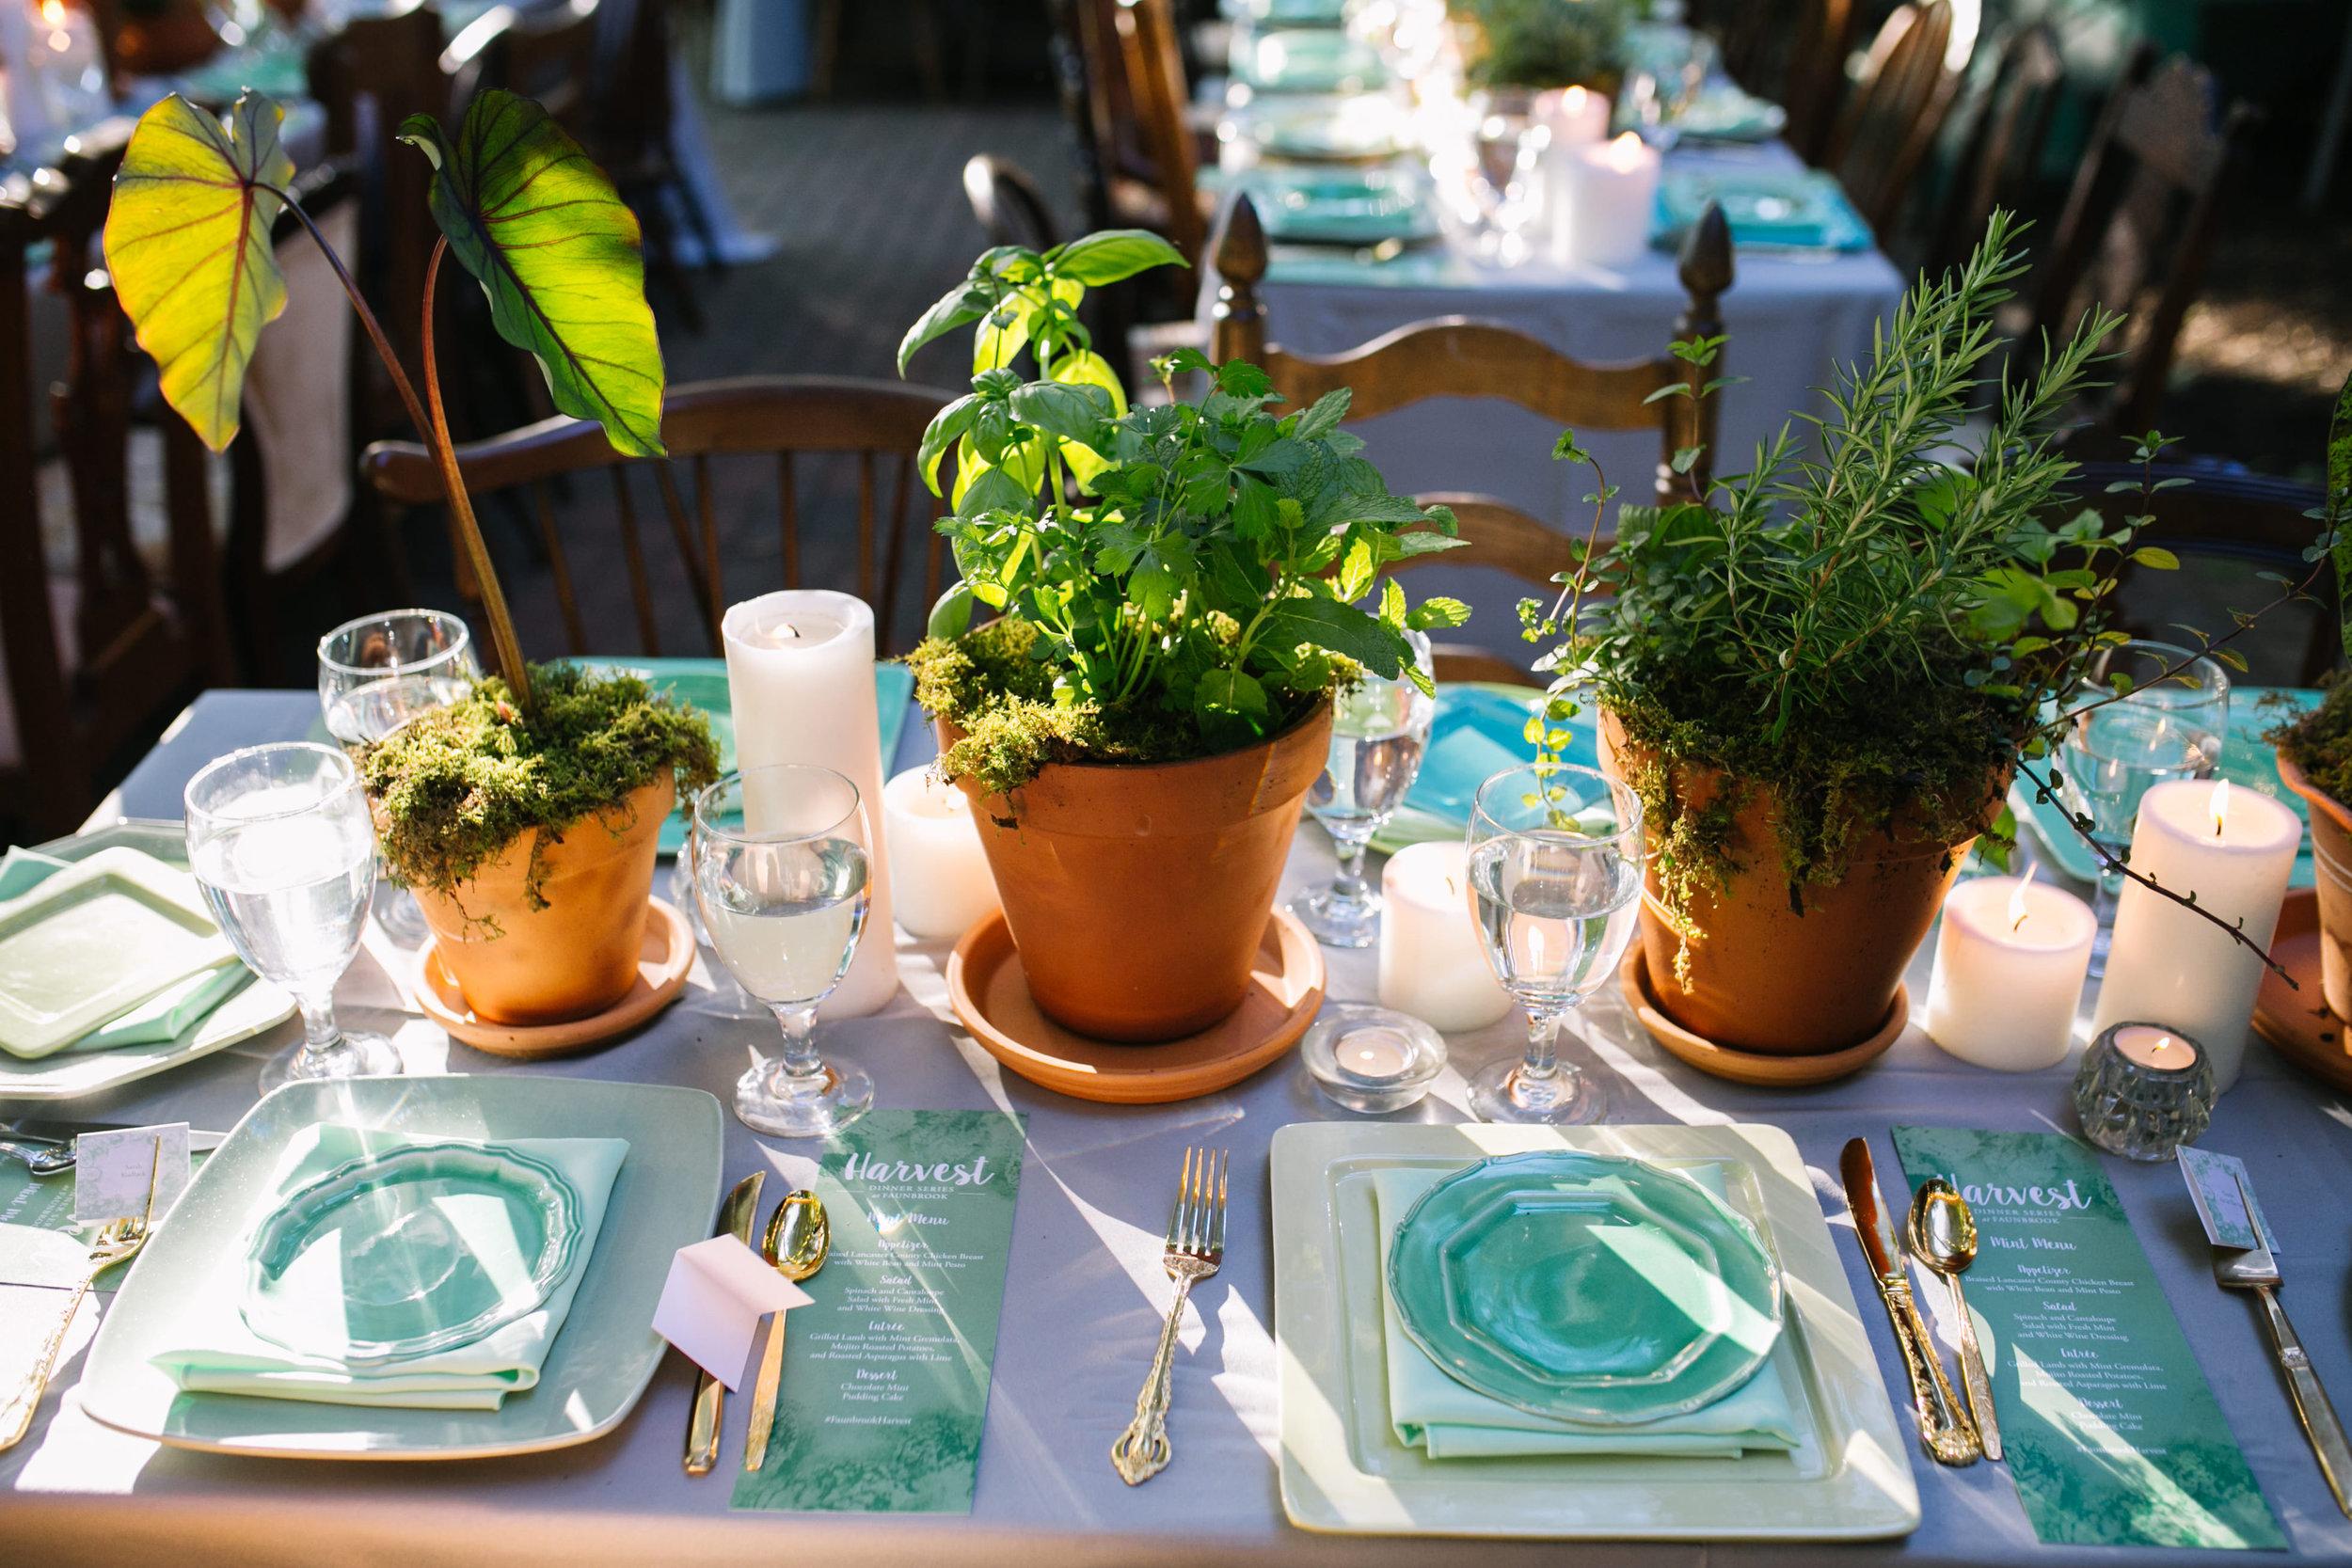 West-Chester-PA-Faunbrook-Harvest-Dinner-Series-Mint-BrittneyRaine-119.JPG